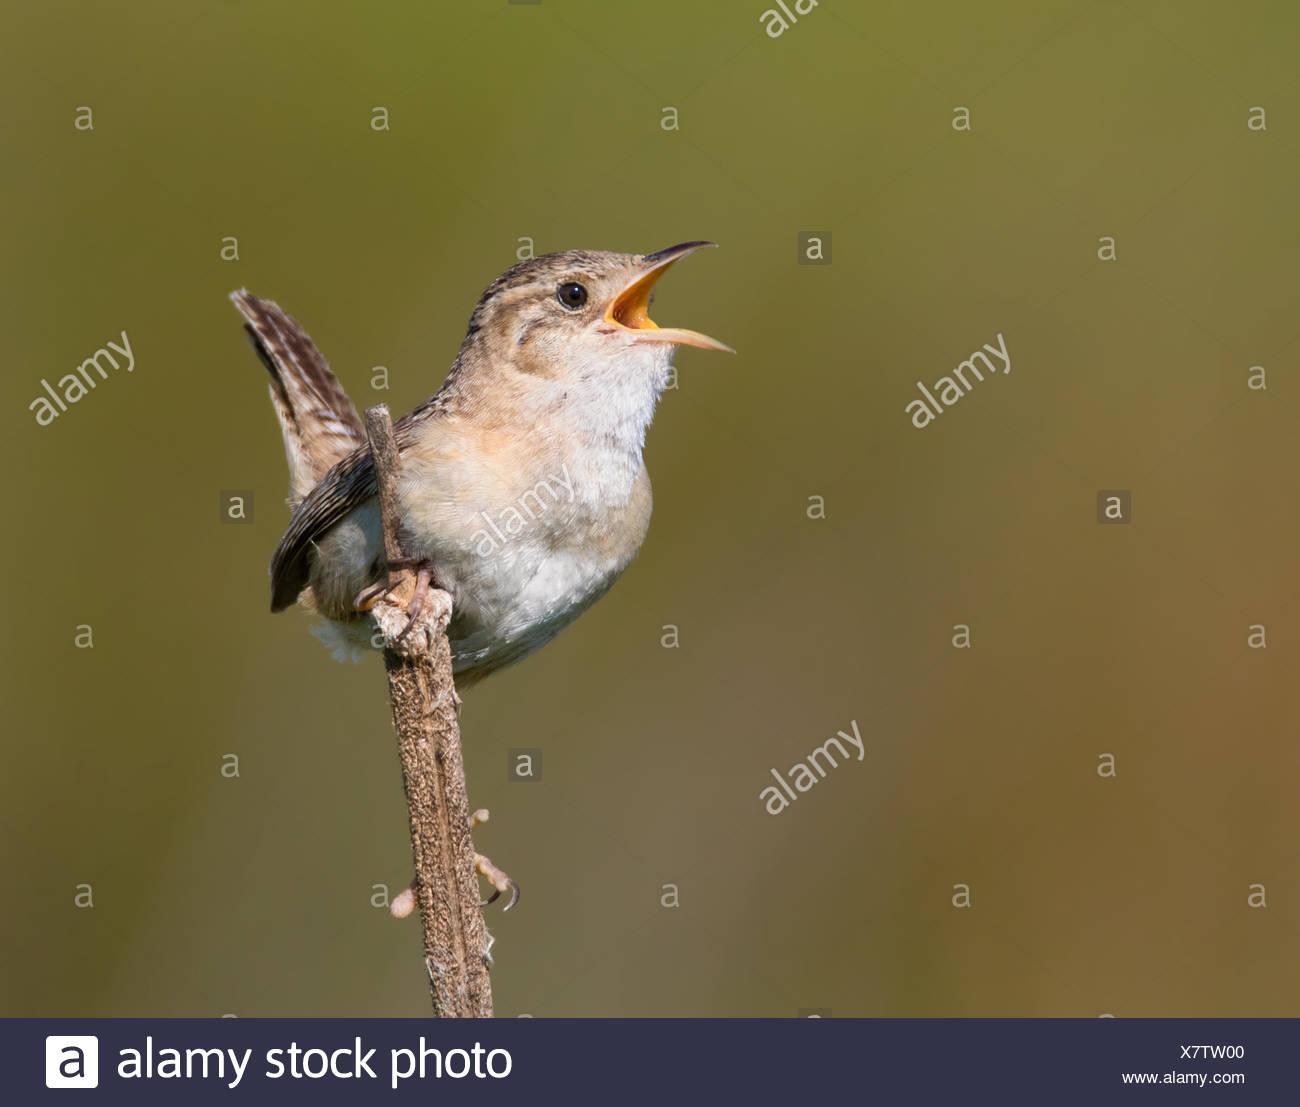 A Sedge Wren, Cistothorus platensis, sings from a perch near Saskatoon, Saskatchewan Stock Photo